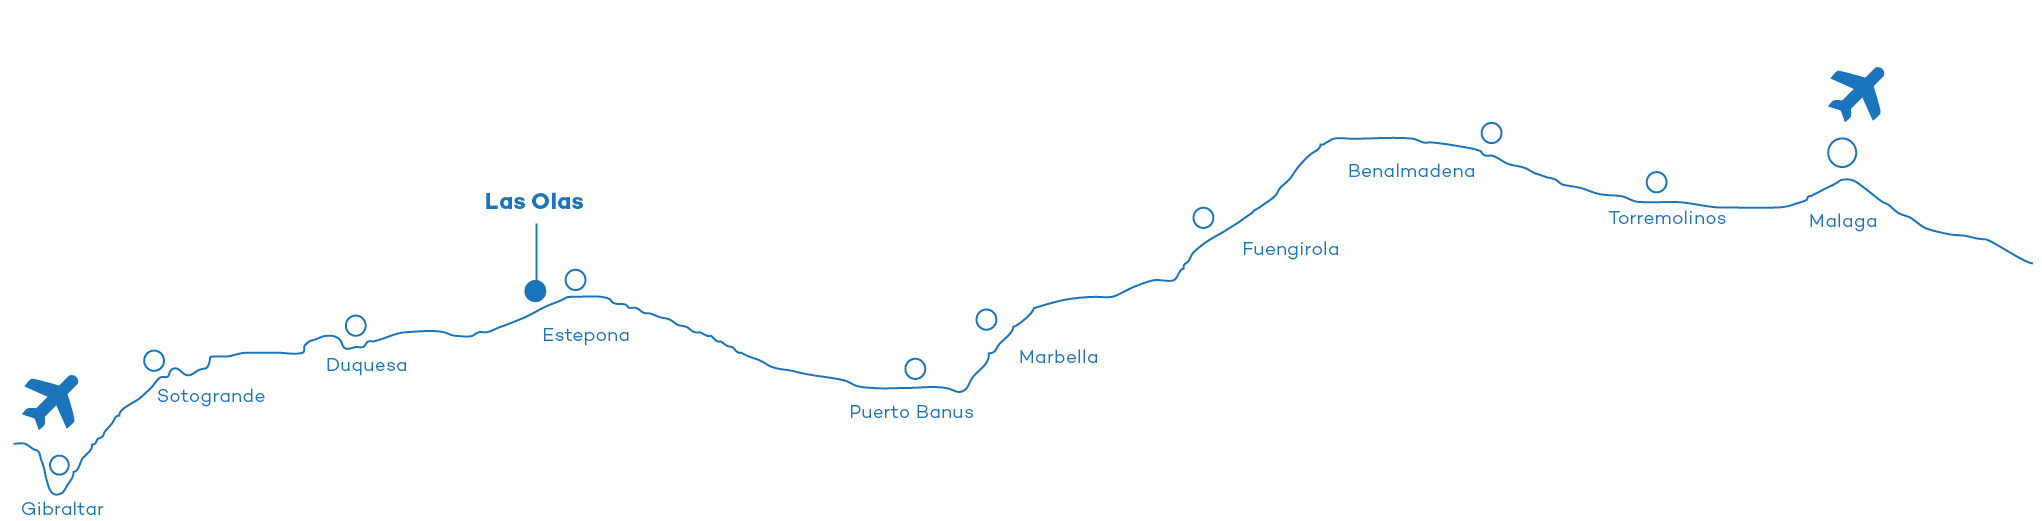 distance fuengirola marbella